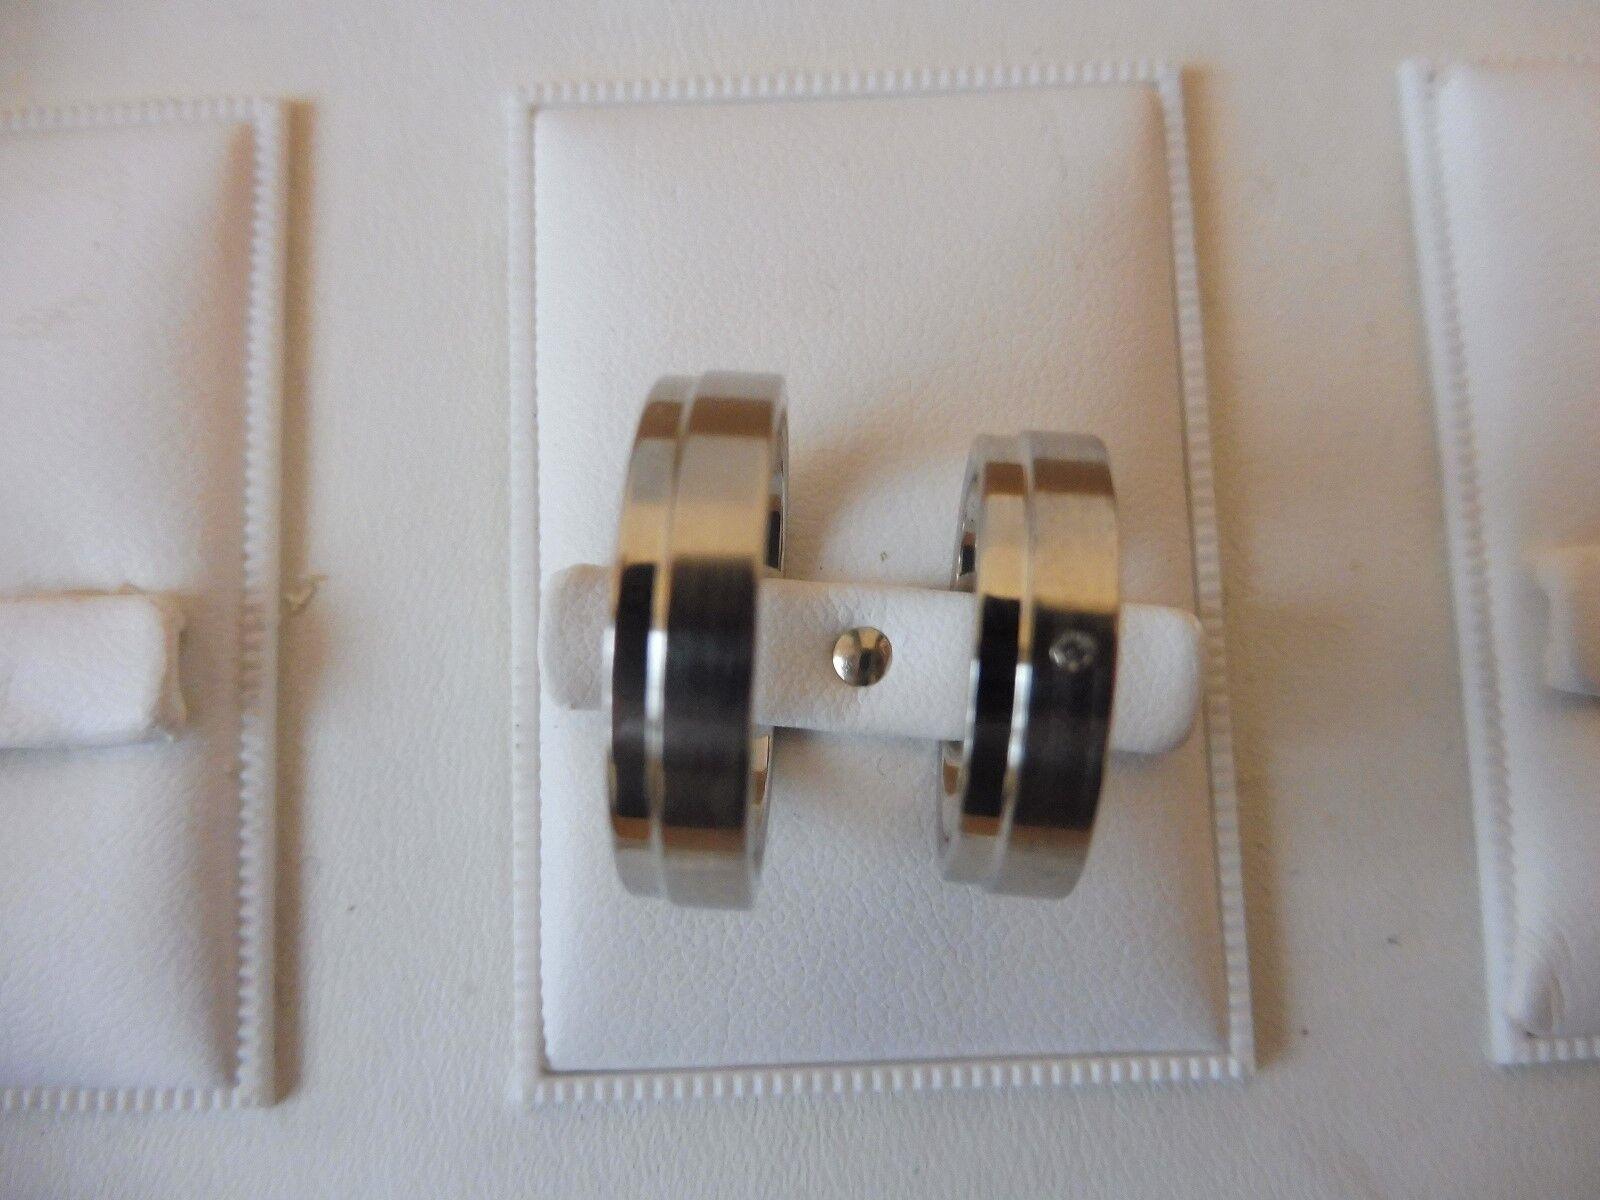 _edles Paar Ringe ( Partnerringe ,Trauringe...)__925 silver__mit Stein__Neu_